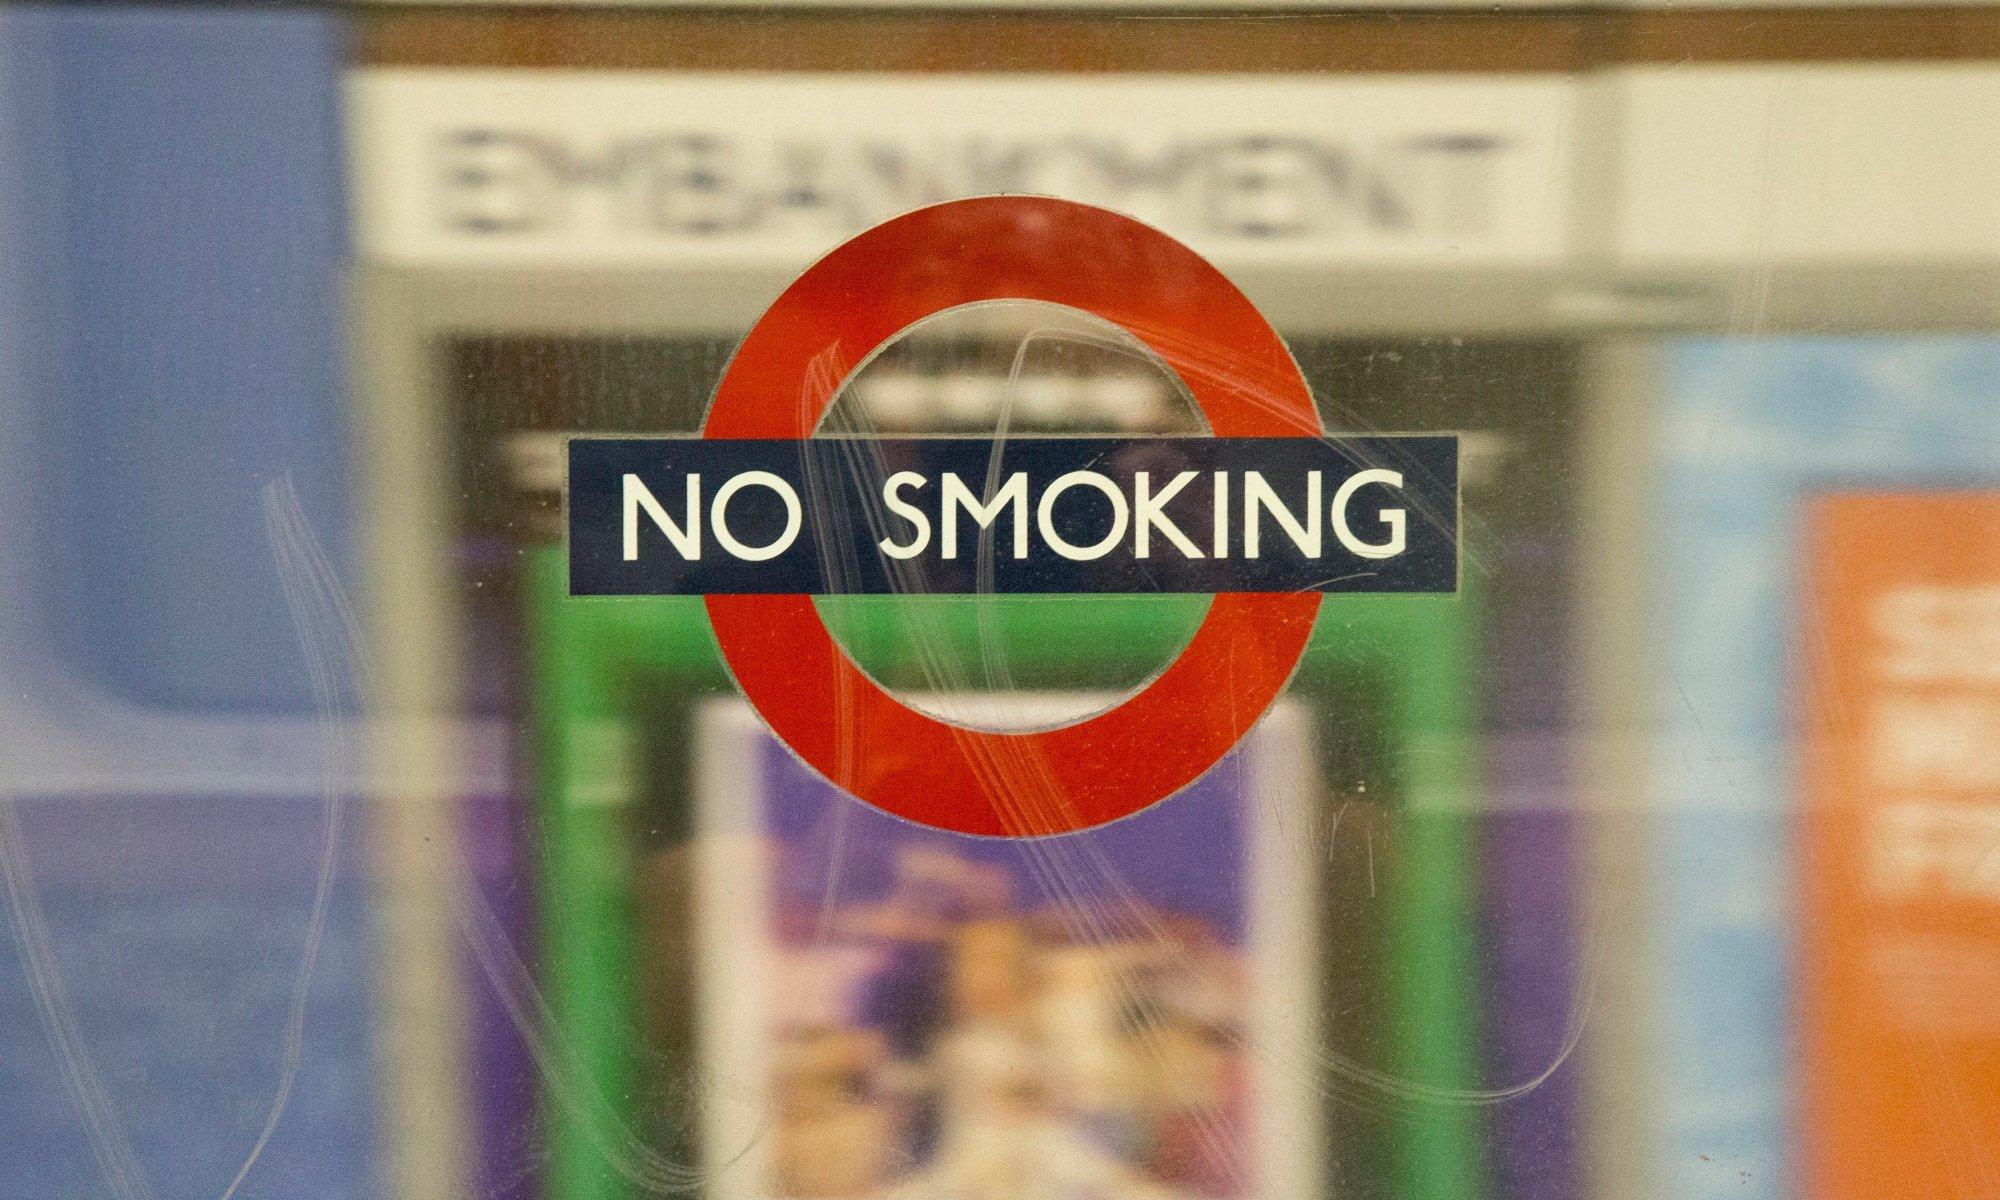 smoking is safe